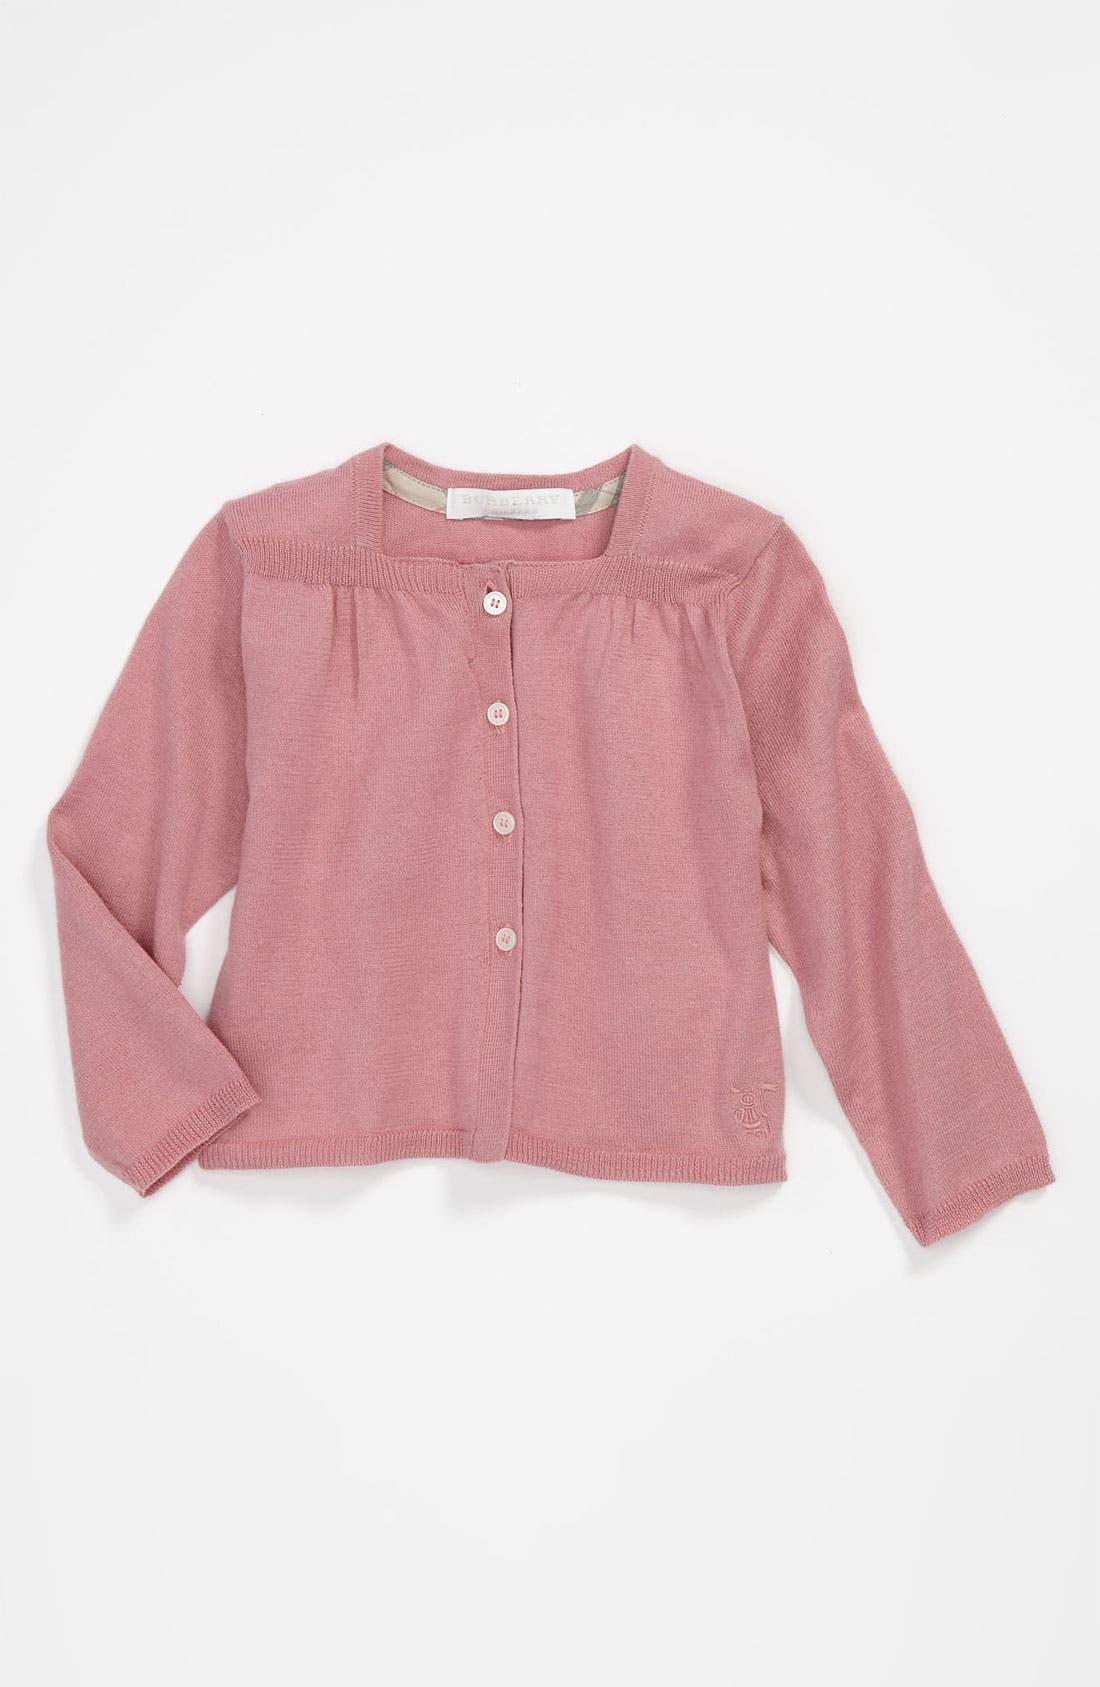 Main Image - Burberry 'Fleur' Knit Cardigan (Baby)